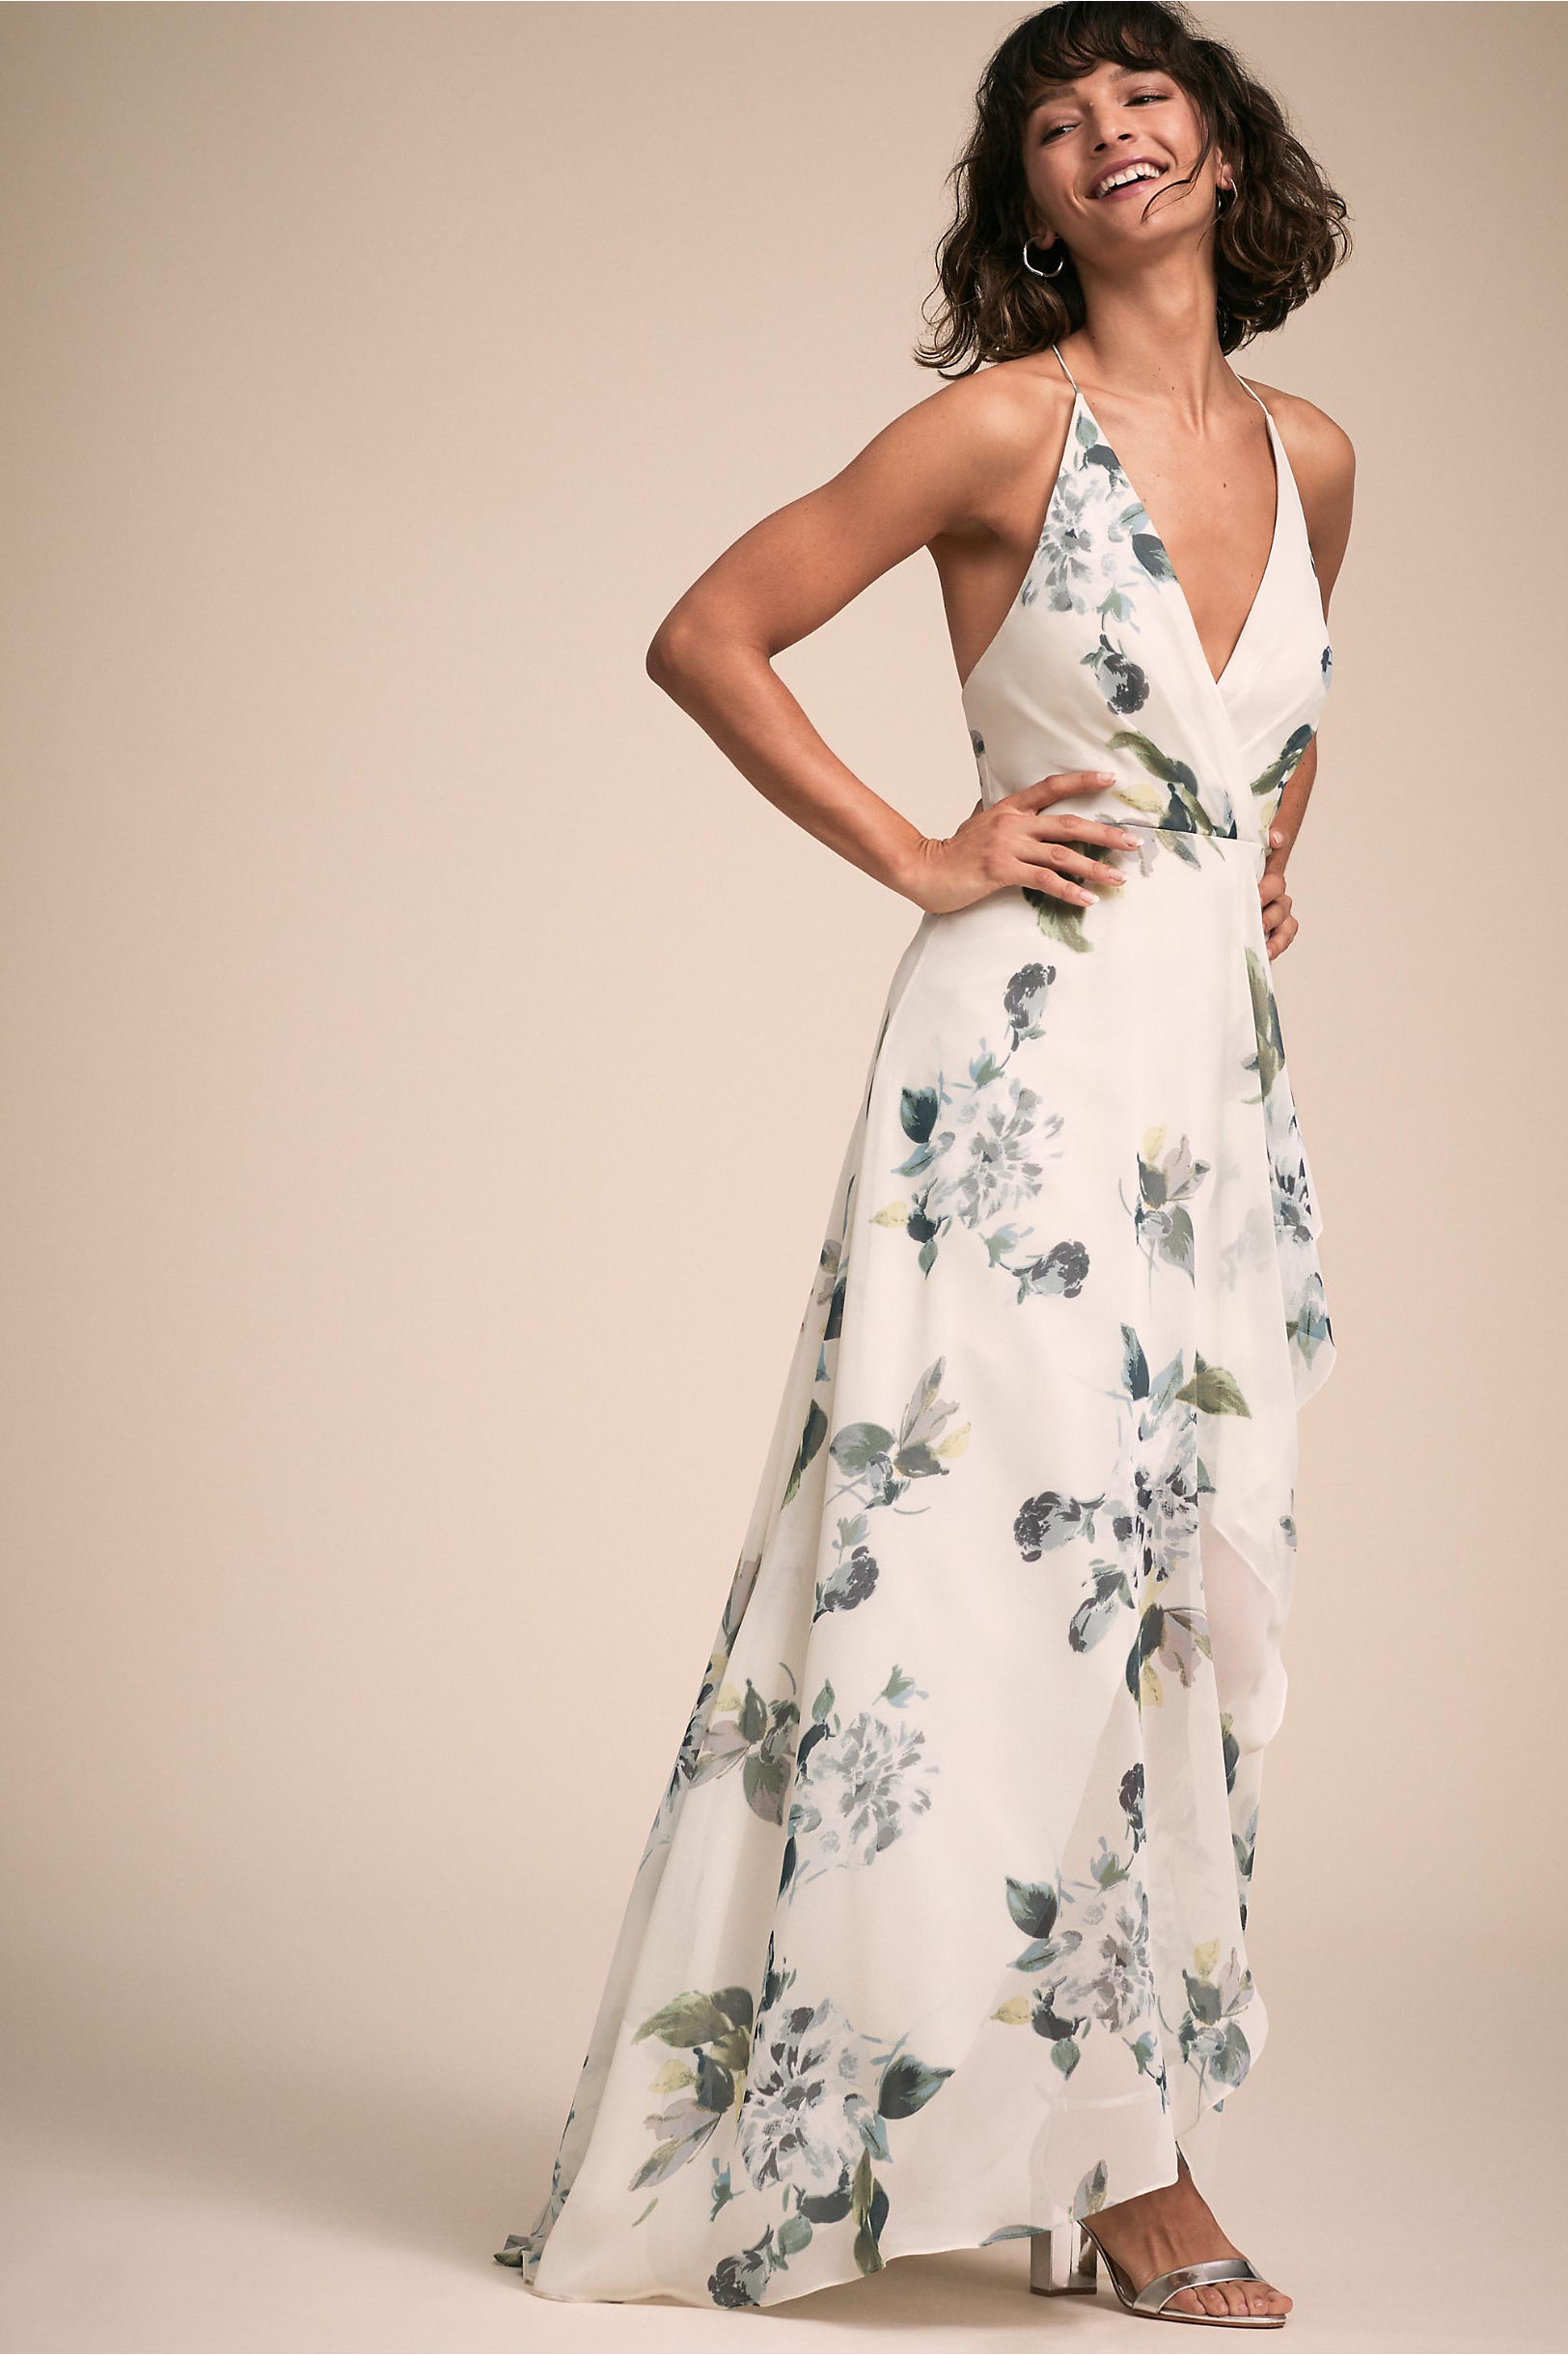 390f761b5ef2 BHLDN's Jenny Yoo Farrah Dress in Ohana Soft Sage Blue Multi ...